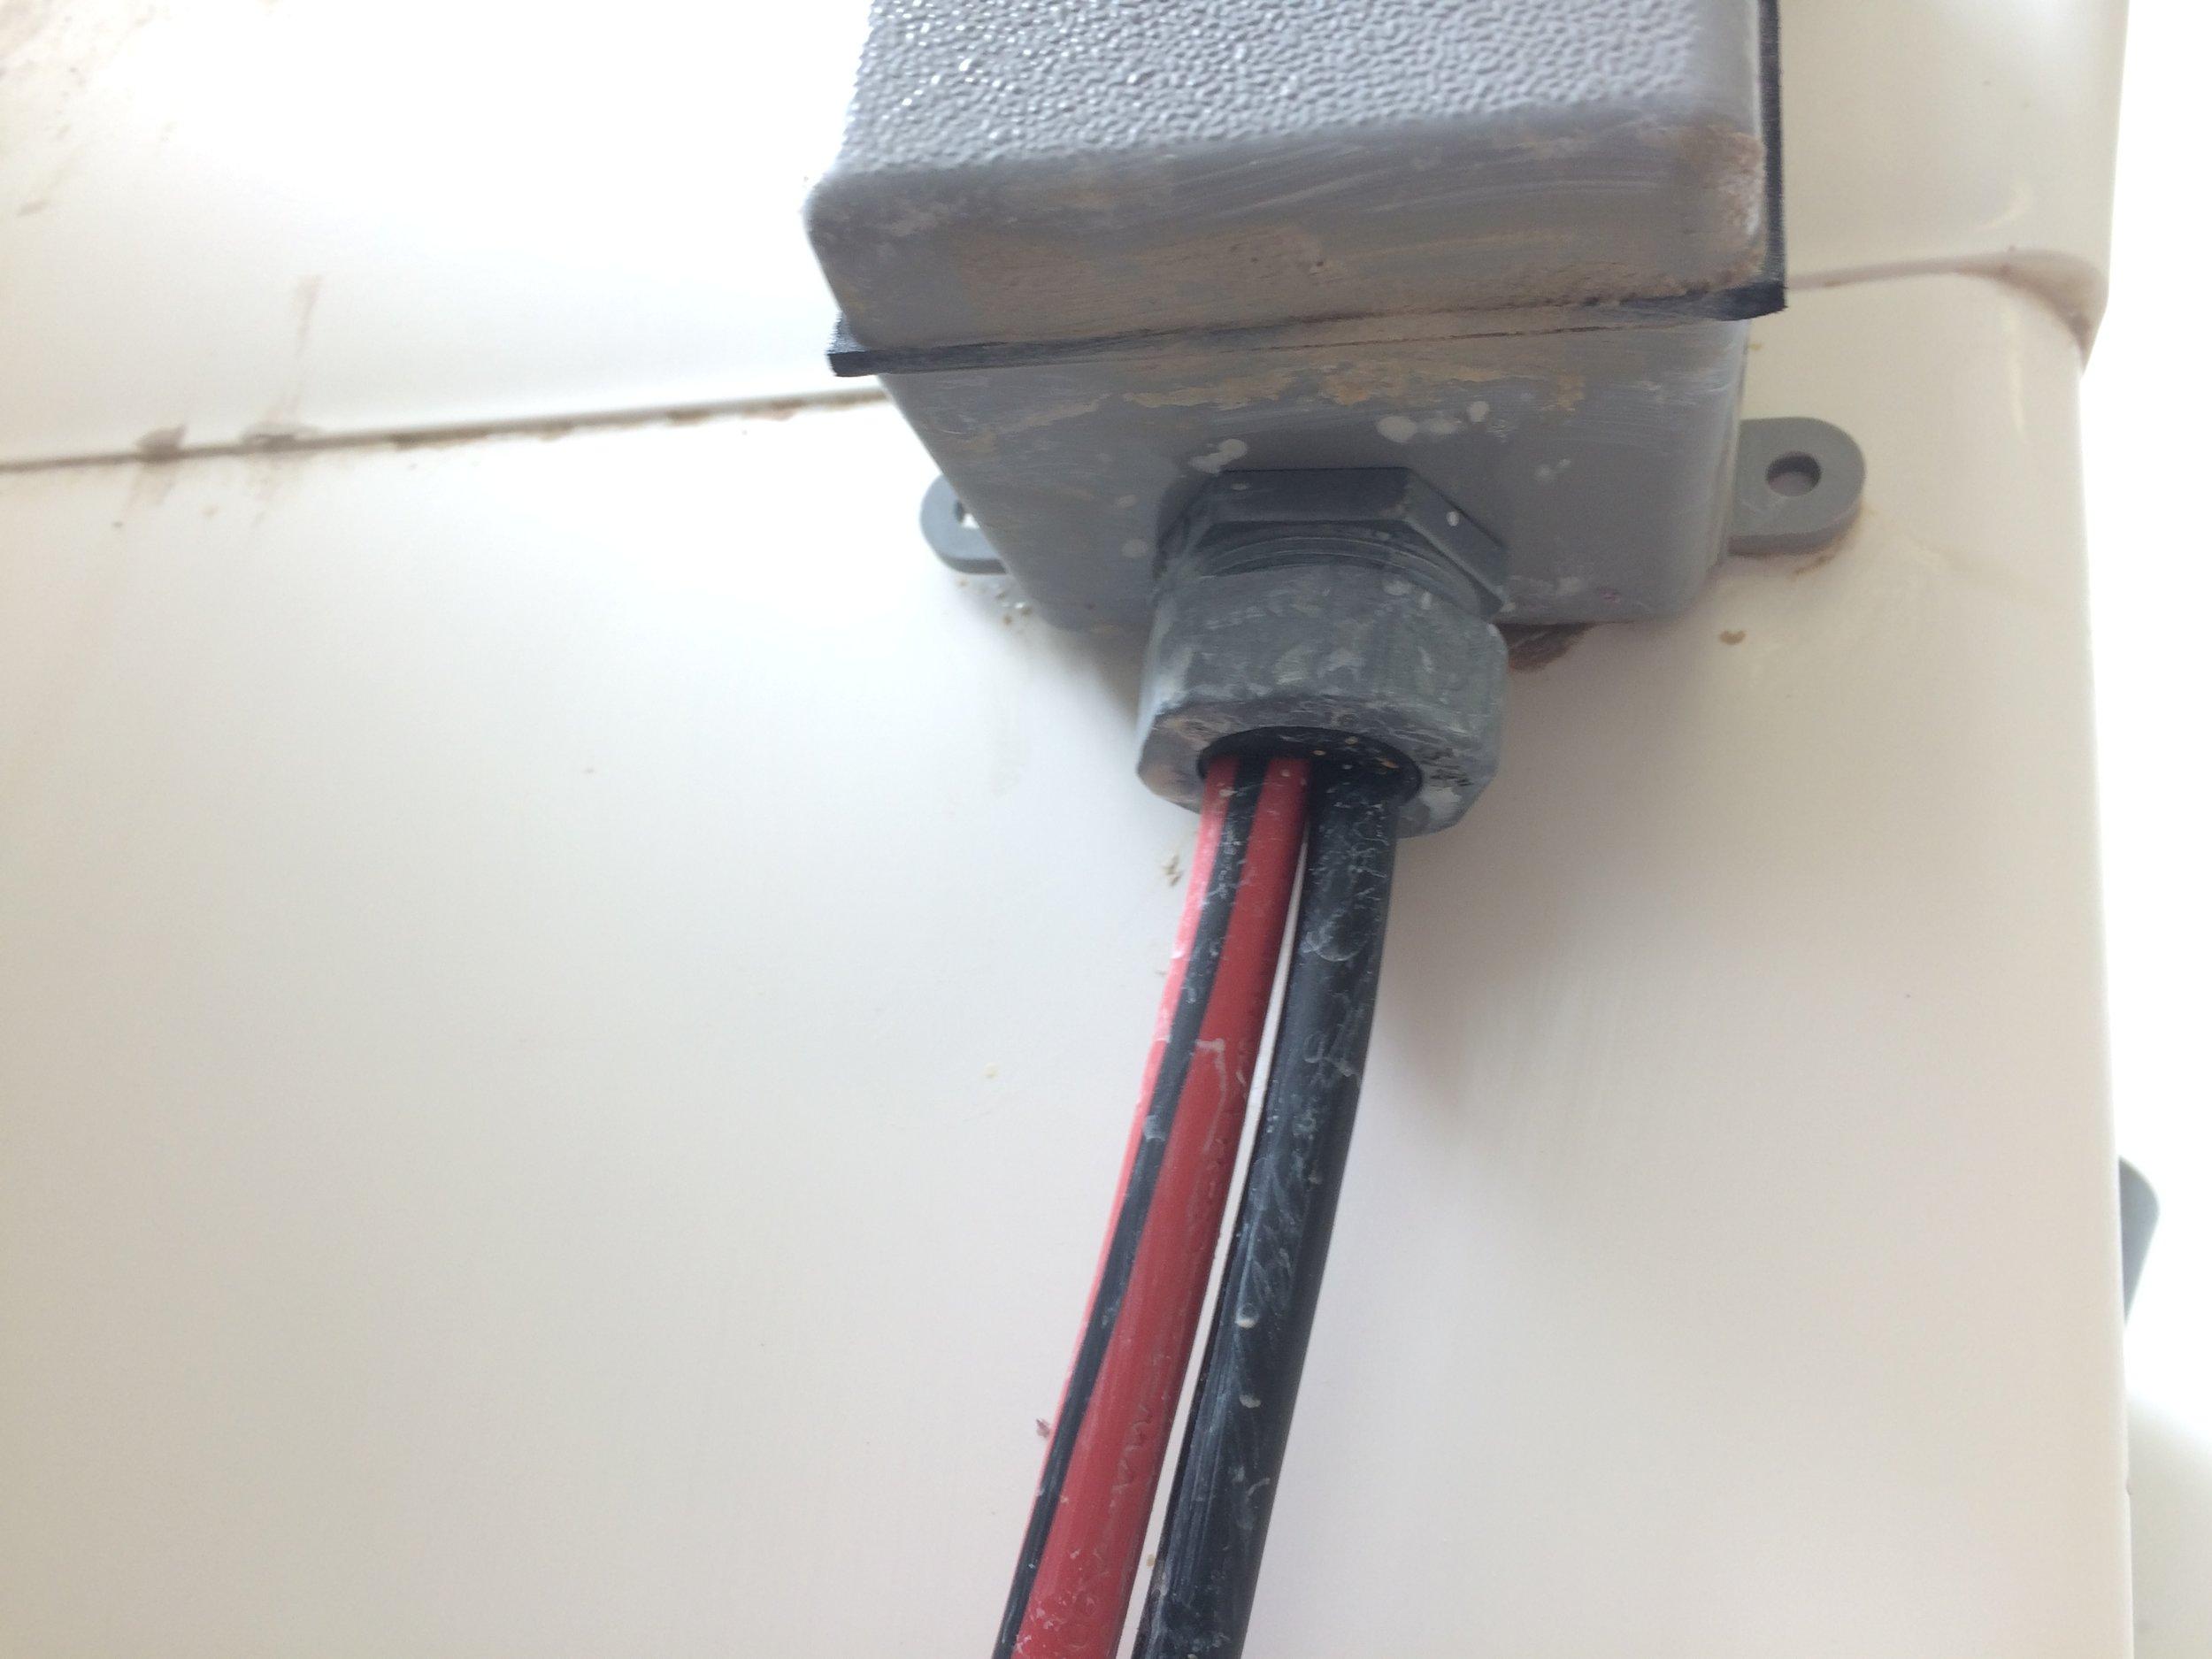 Recirc_Sink_Cables.JPG